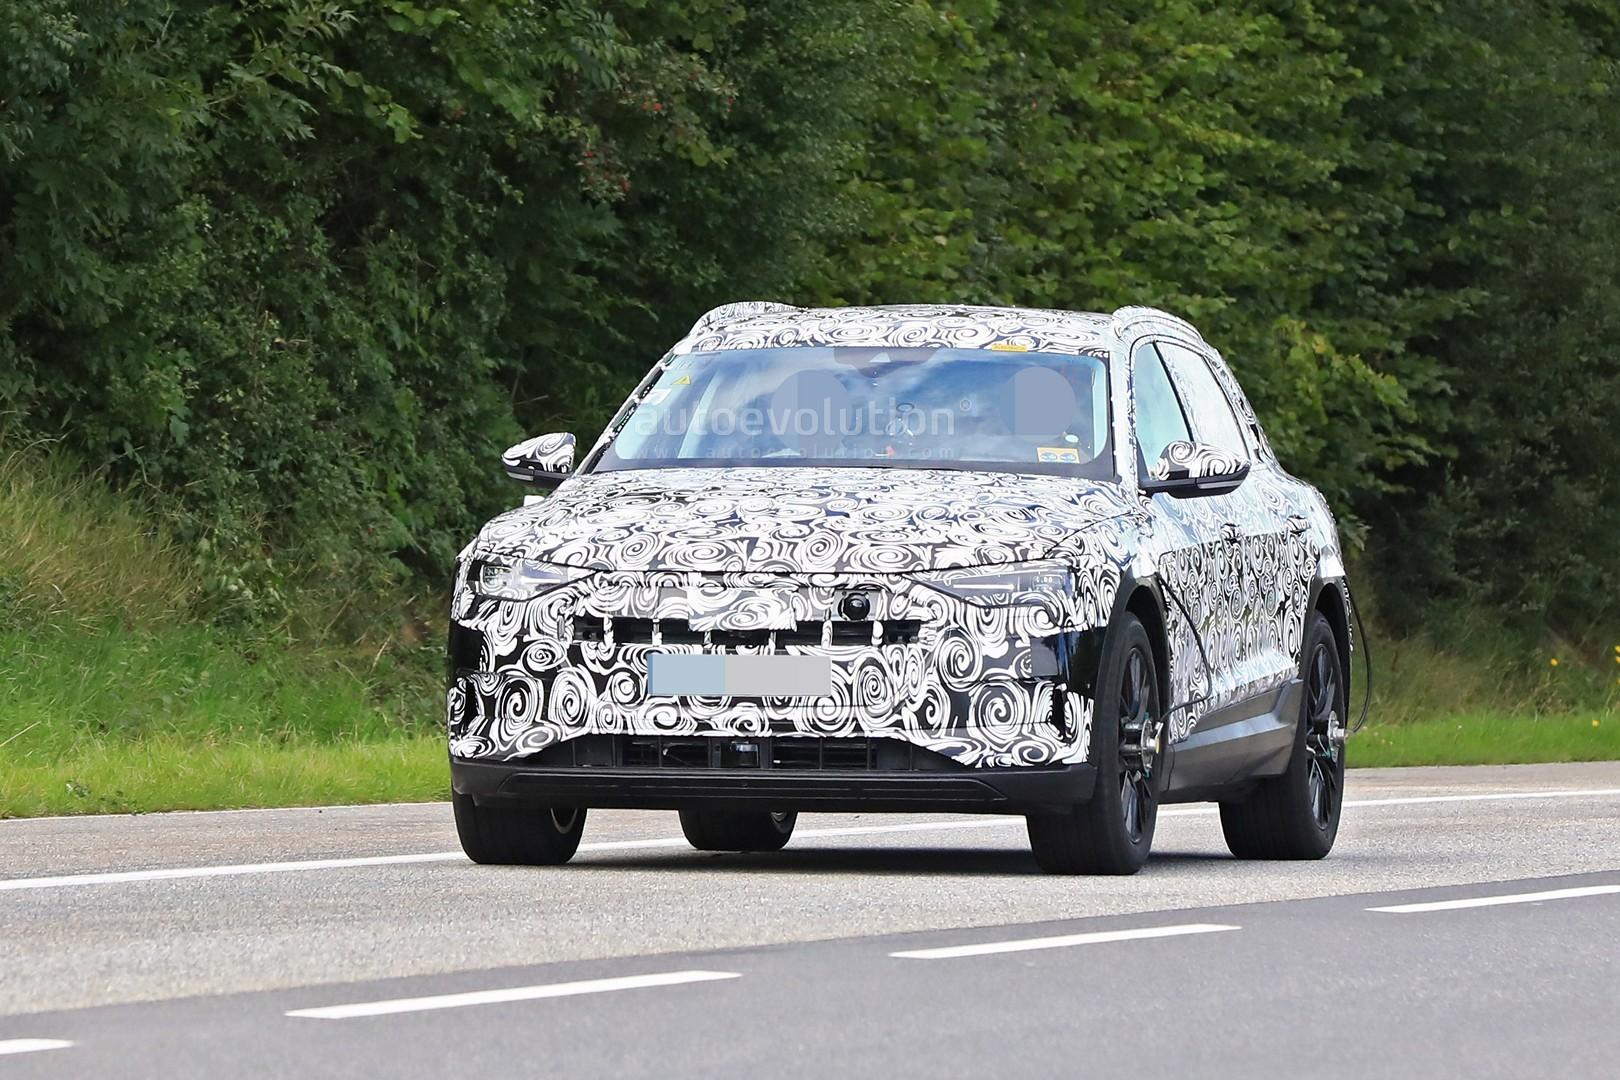 2019 Audi e-tron SUV: Tesla Rival Spied Testing Around ...